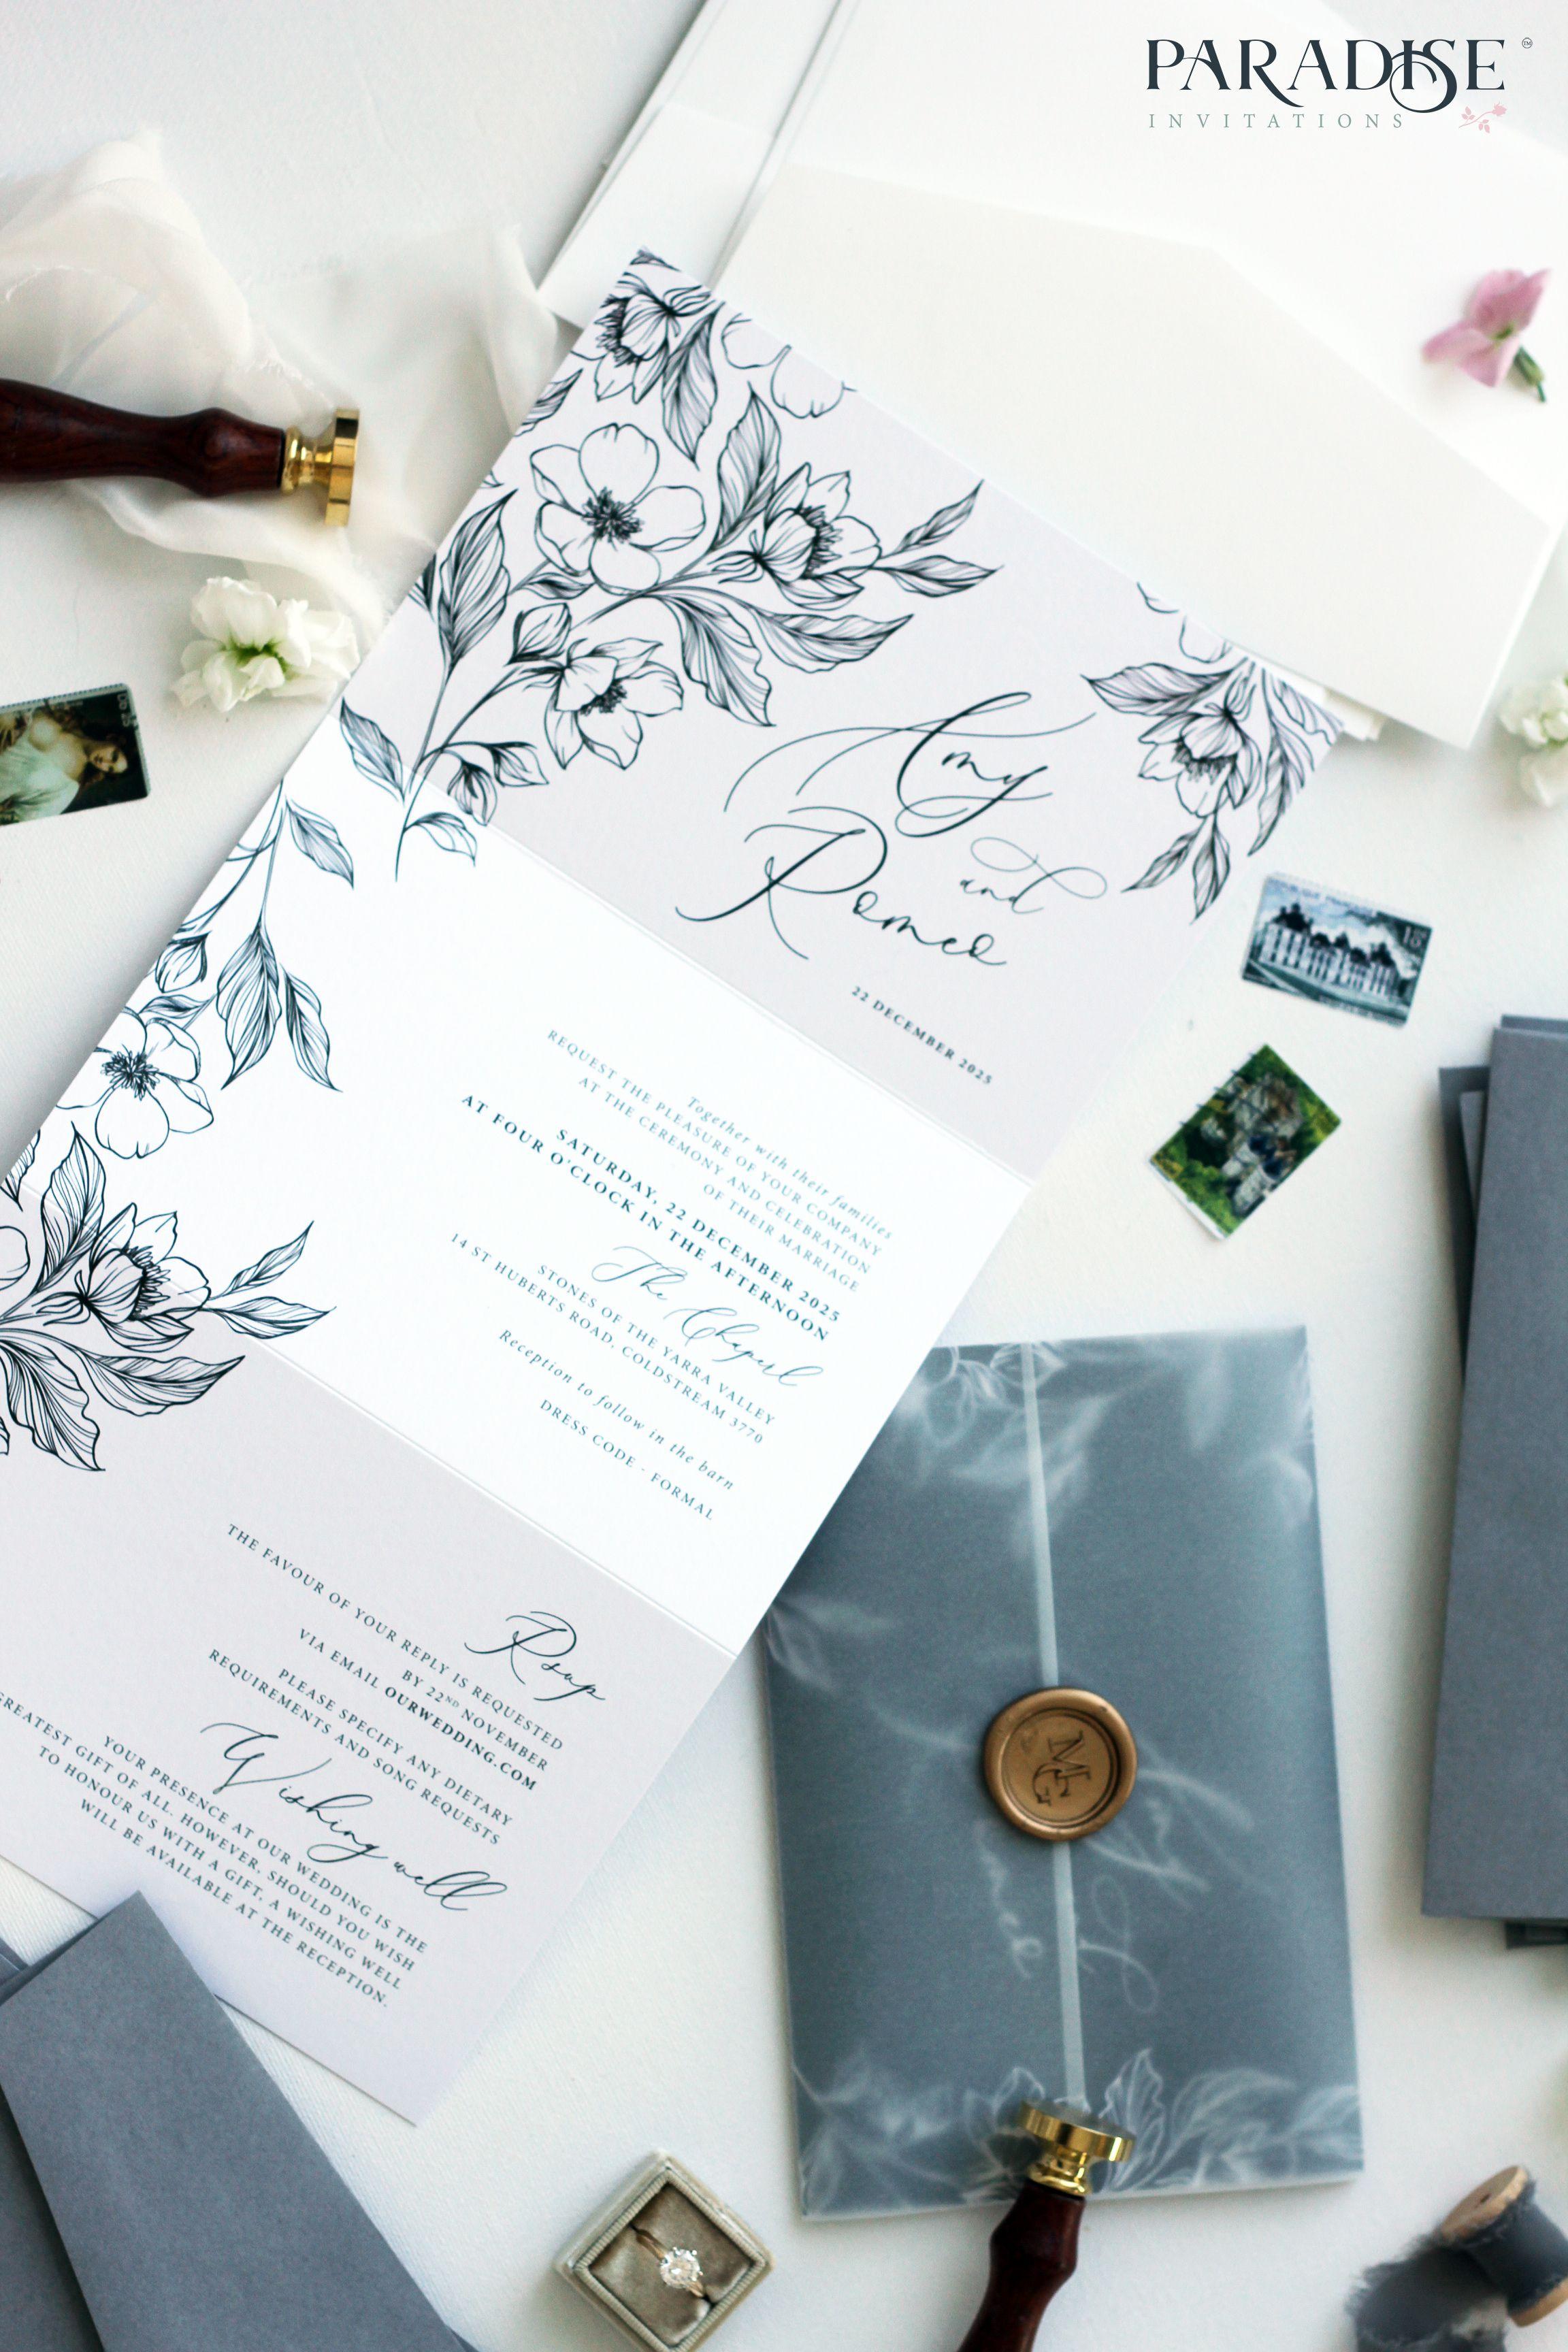 Anne Cecile Hand Drawn Floral Tri Fold Wedding Invitation Undangan Pernikahan Mewah Kartu Undangan Pernikahan Contoh Undangan Pernikahan